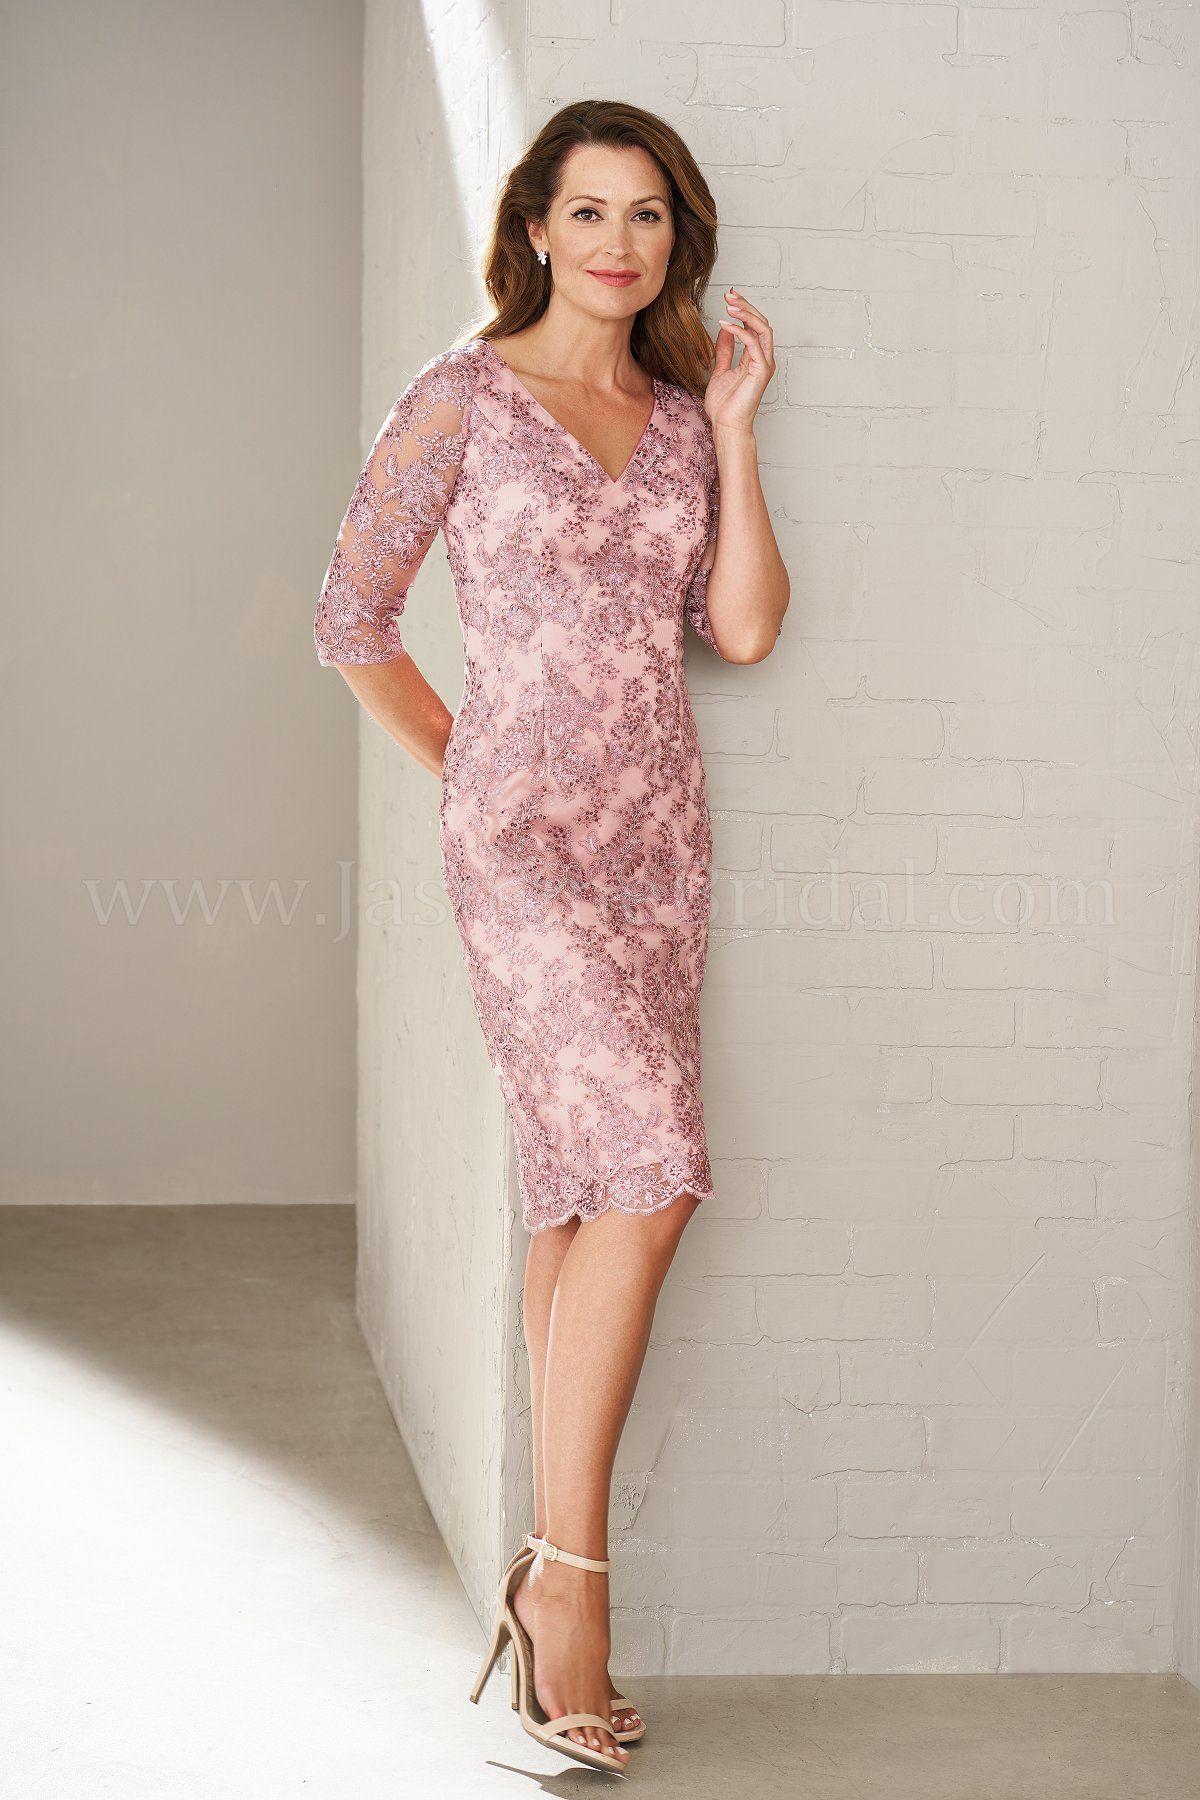 Jasmine Bridal Black Label Style M200009 In Rose Quartz Chelsea Lace Stretch Lining V Neckline 3 4 Sleeves Scalloped Skirt